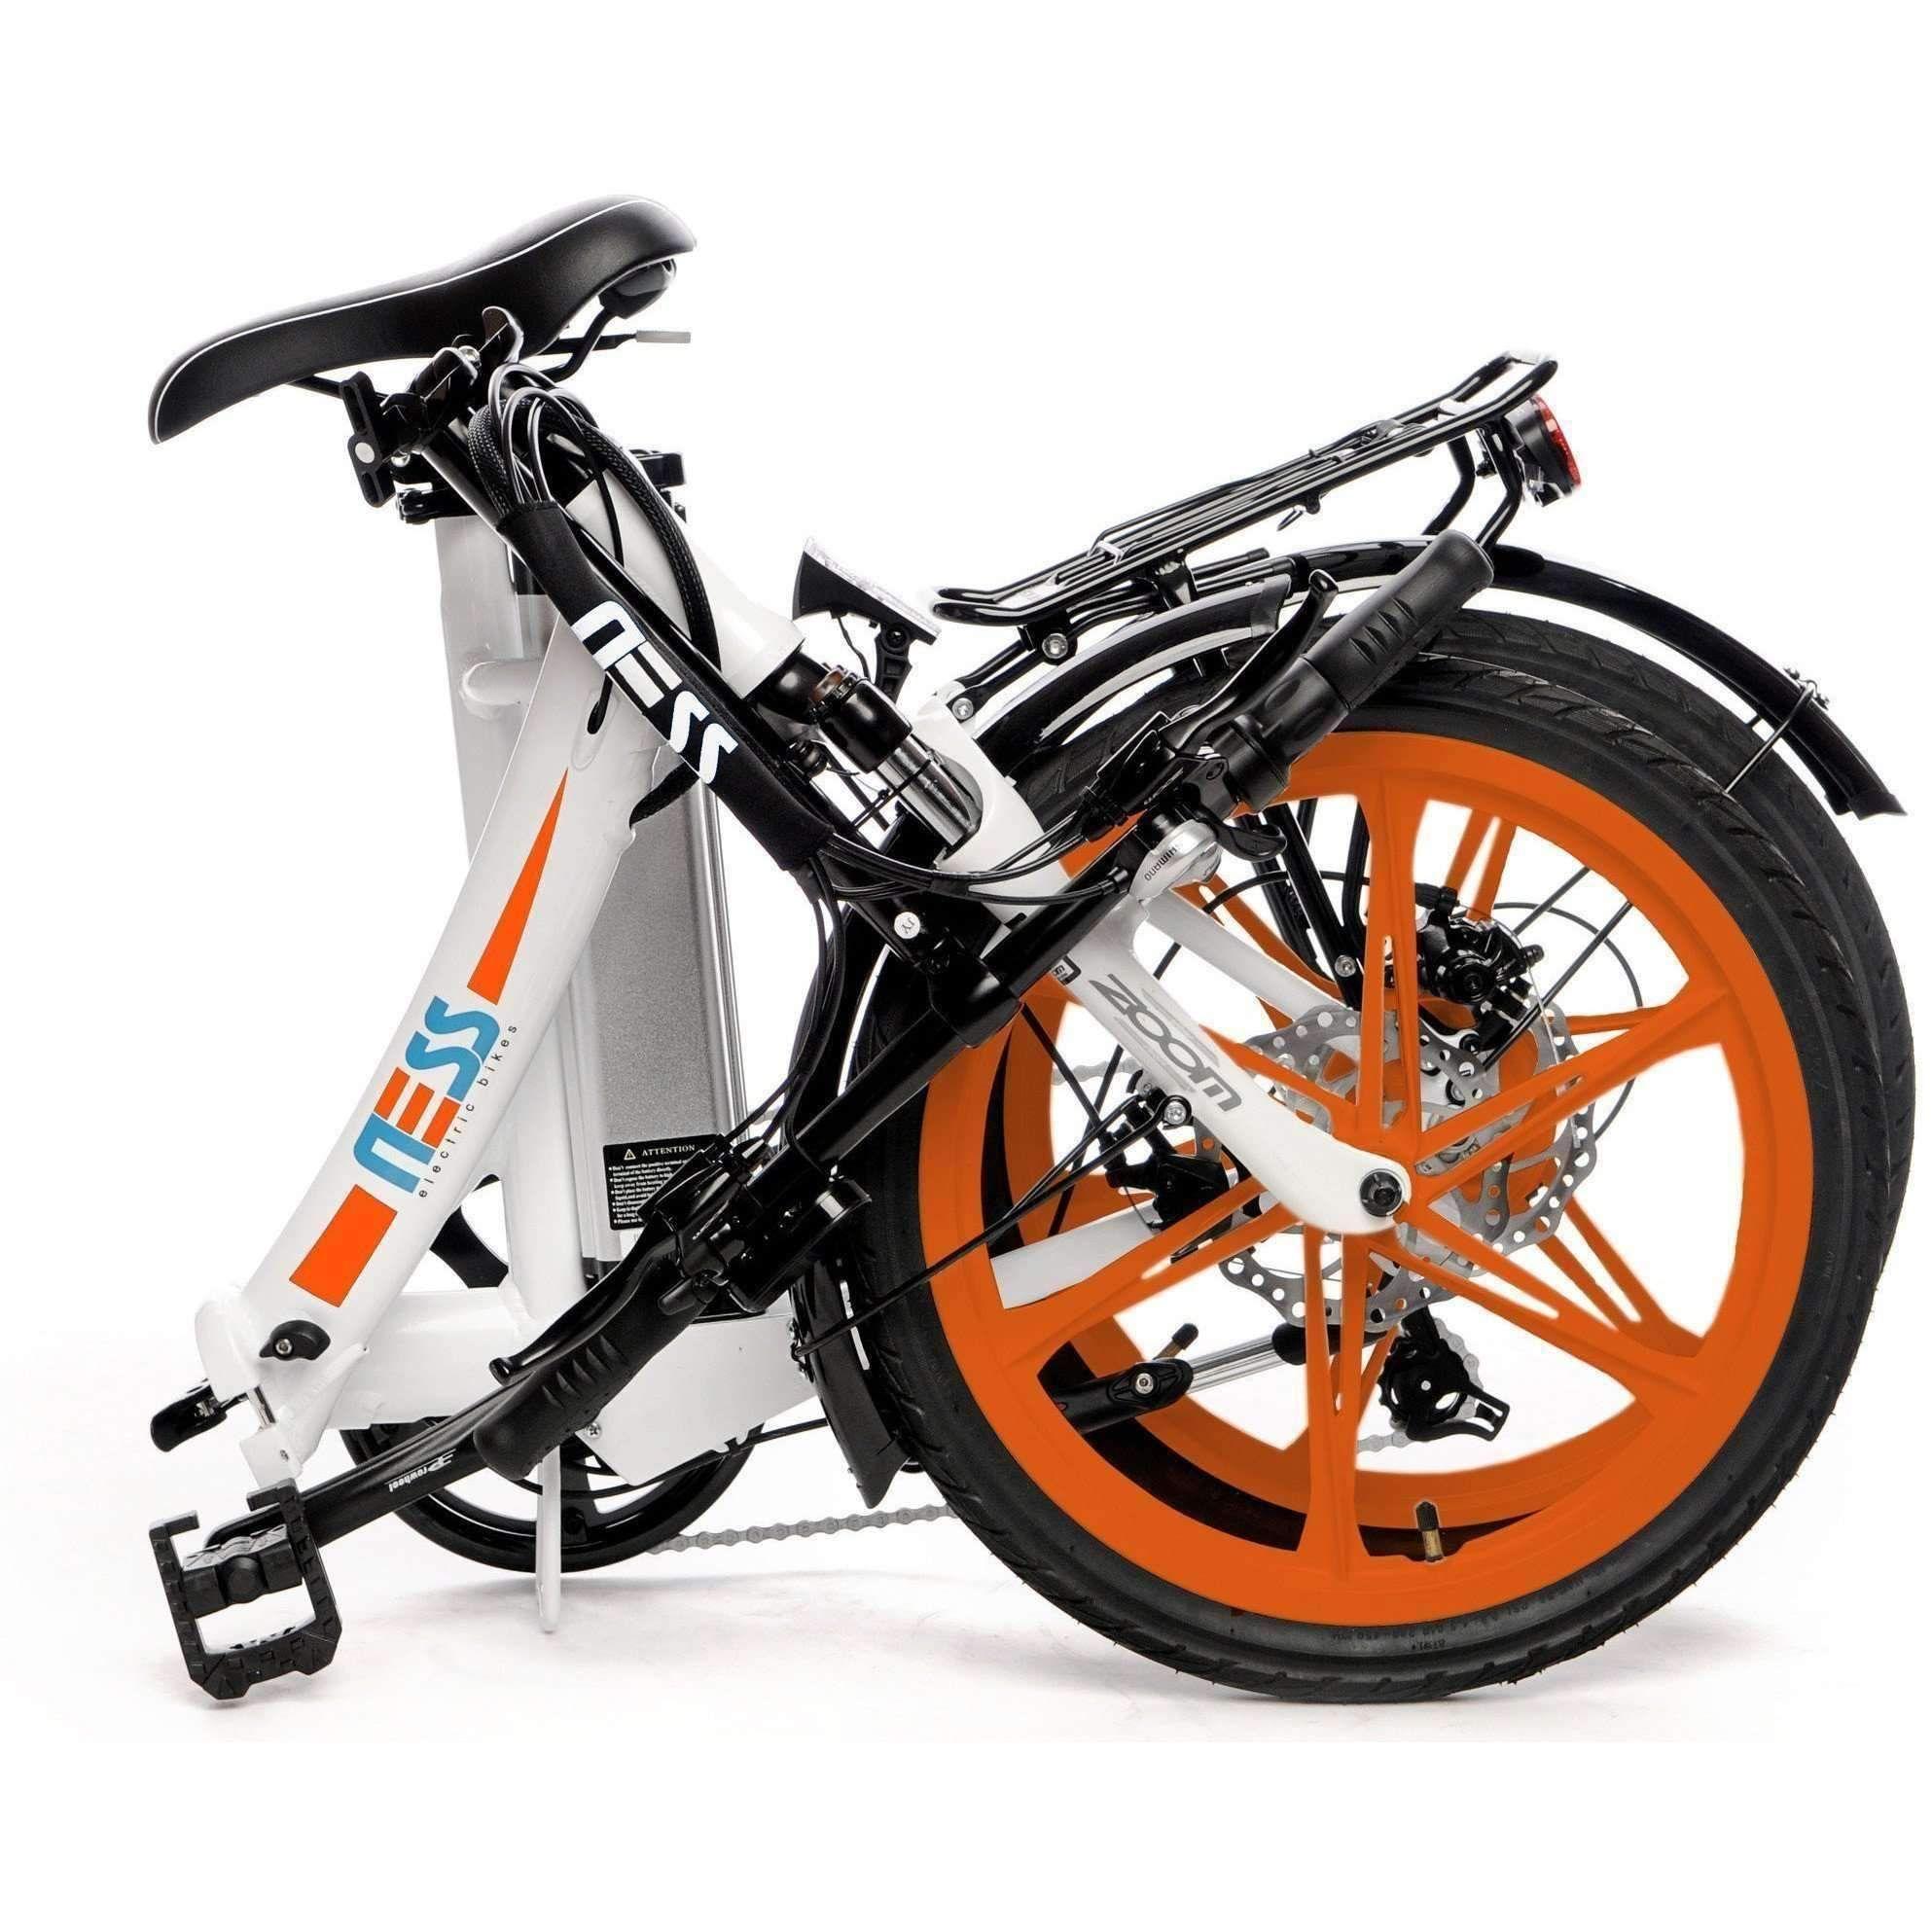 e200a1e2fdb 10 Best Folding Electric Bikes for 2019 | Bikes | Folding electric ...